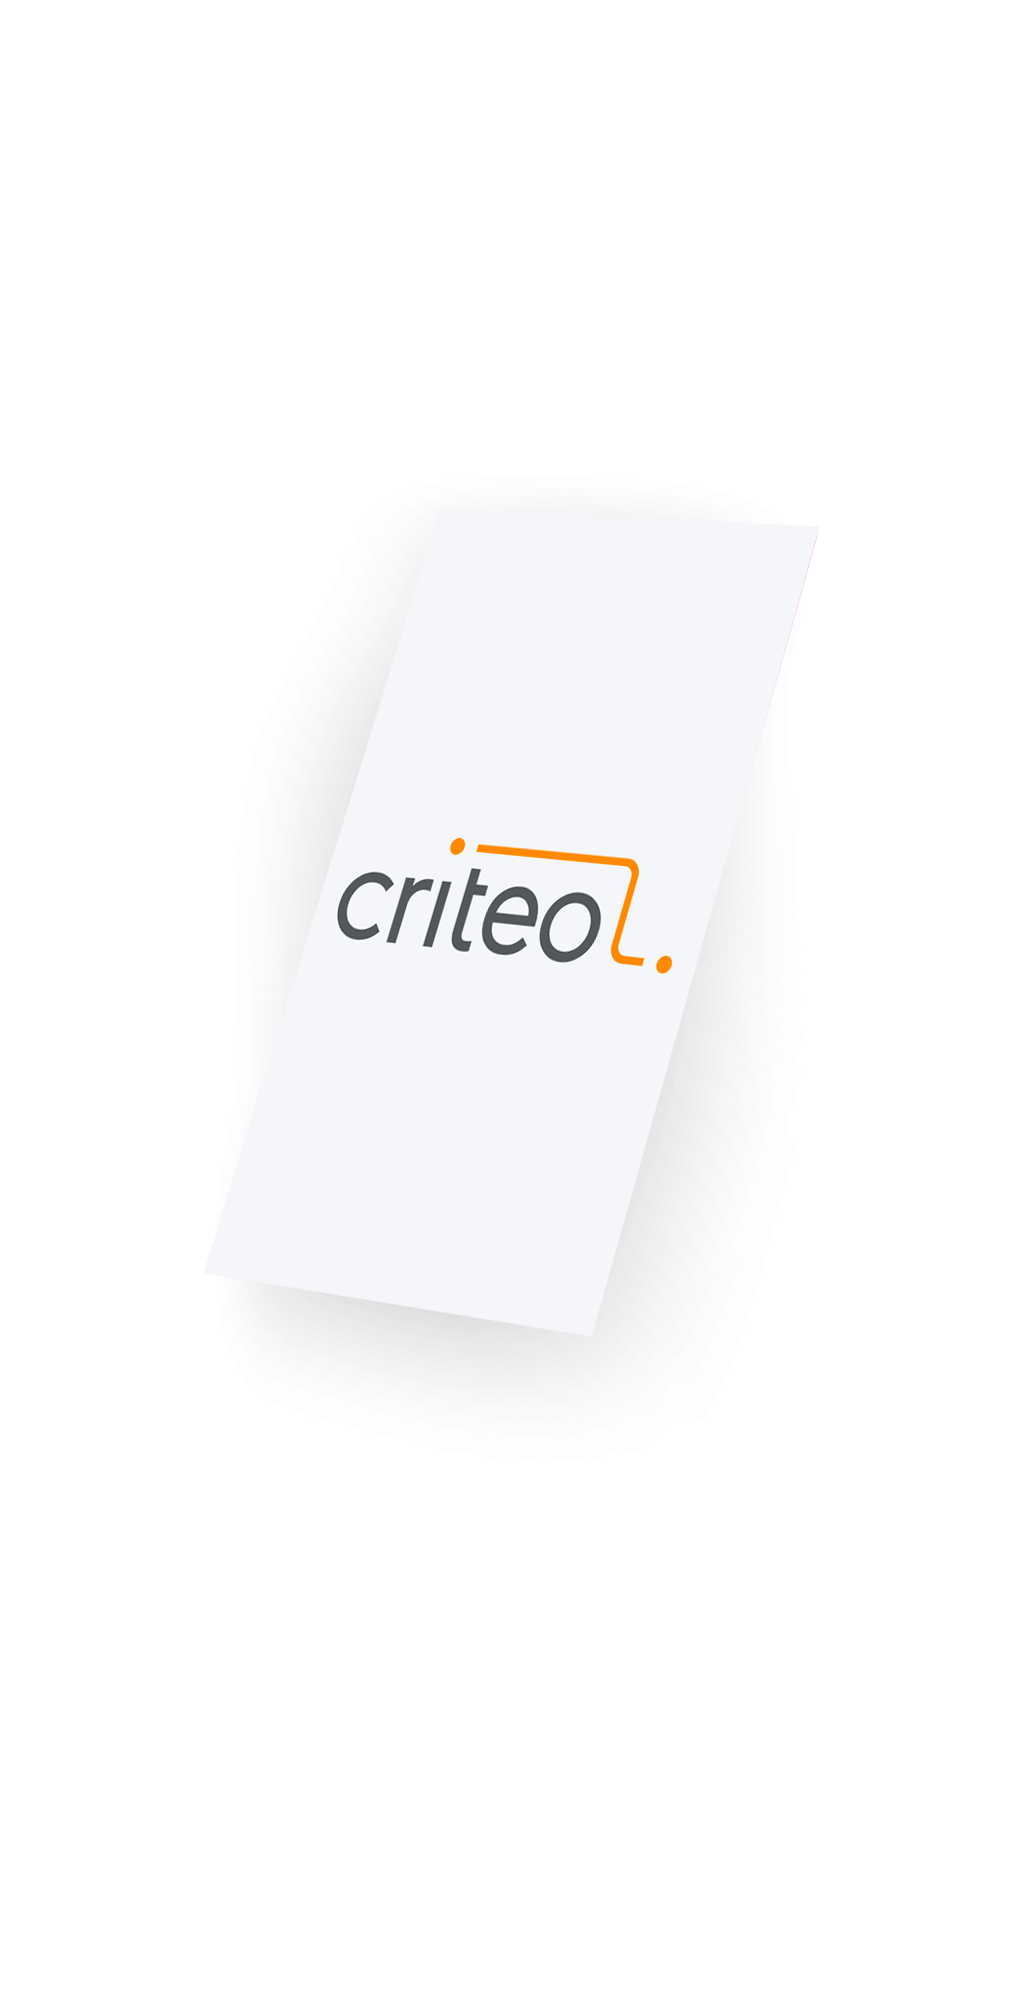 criteo-enhance-digital